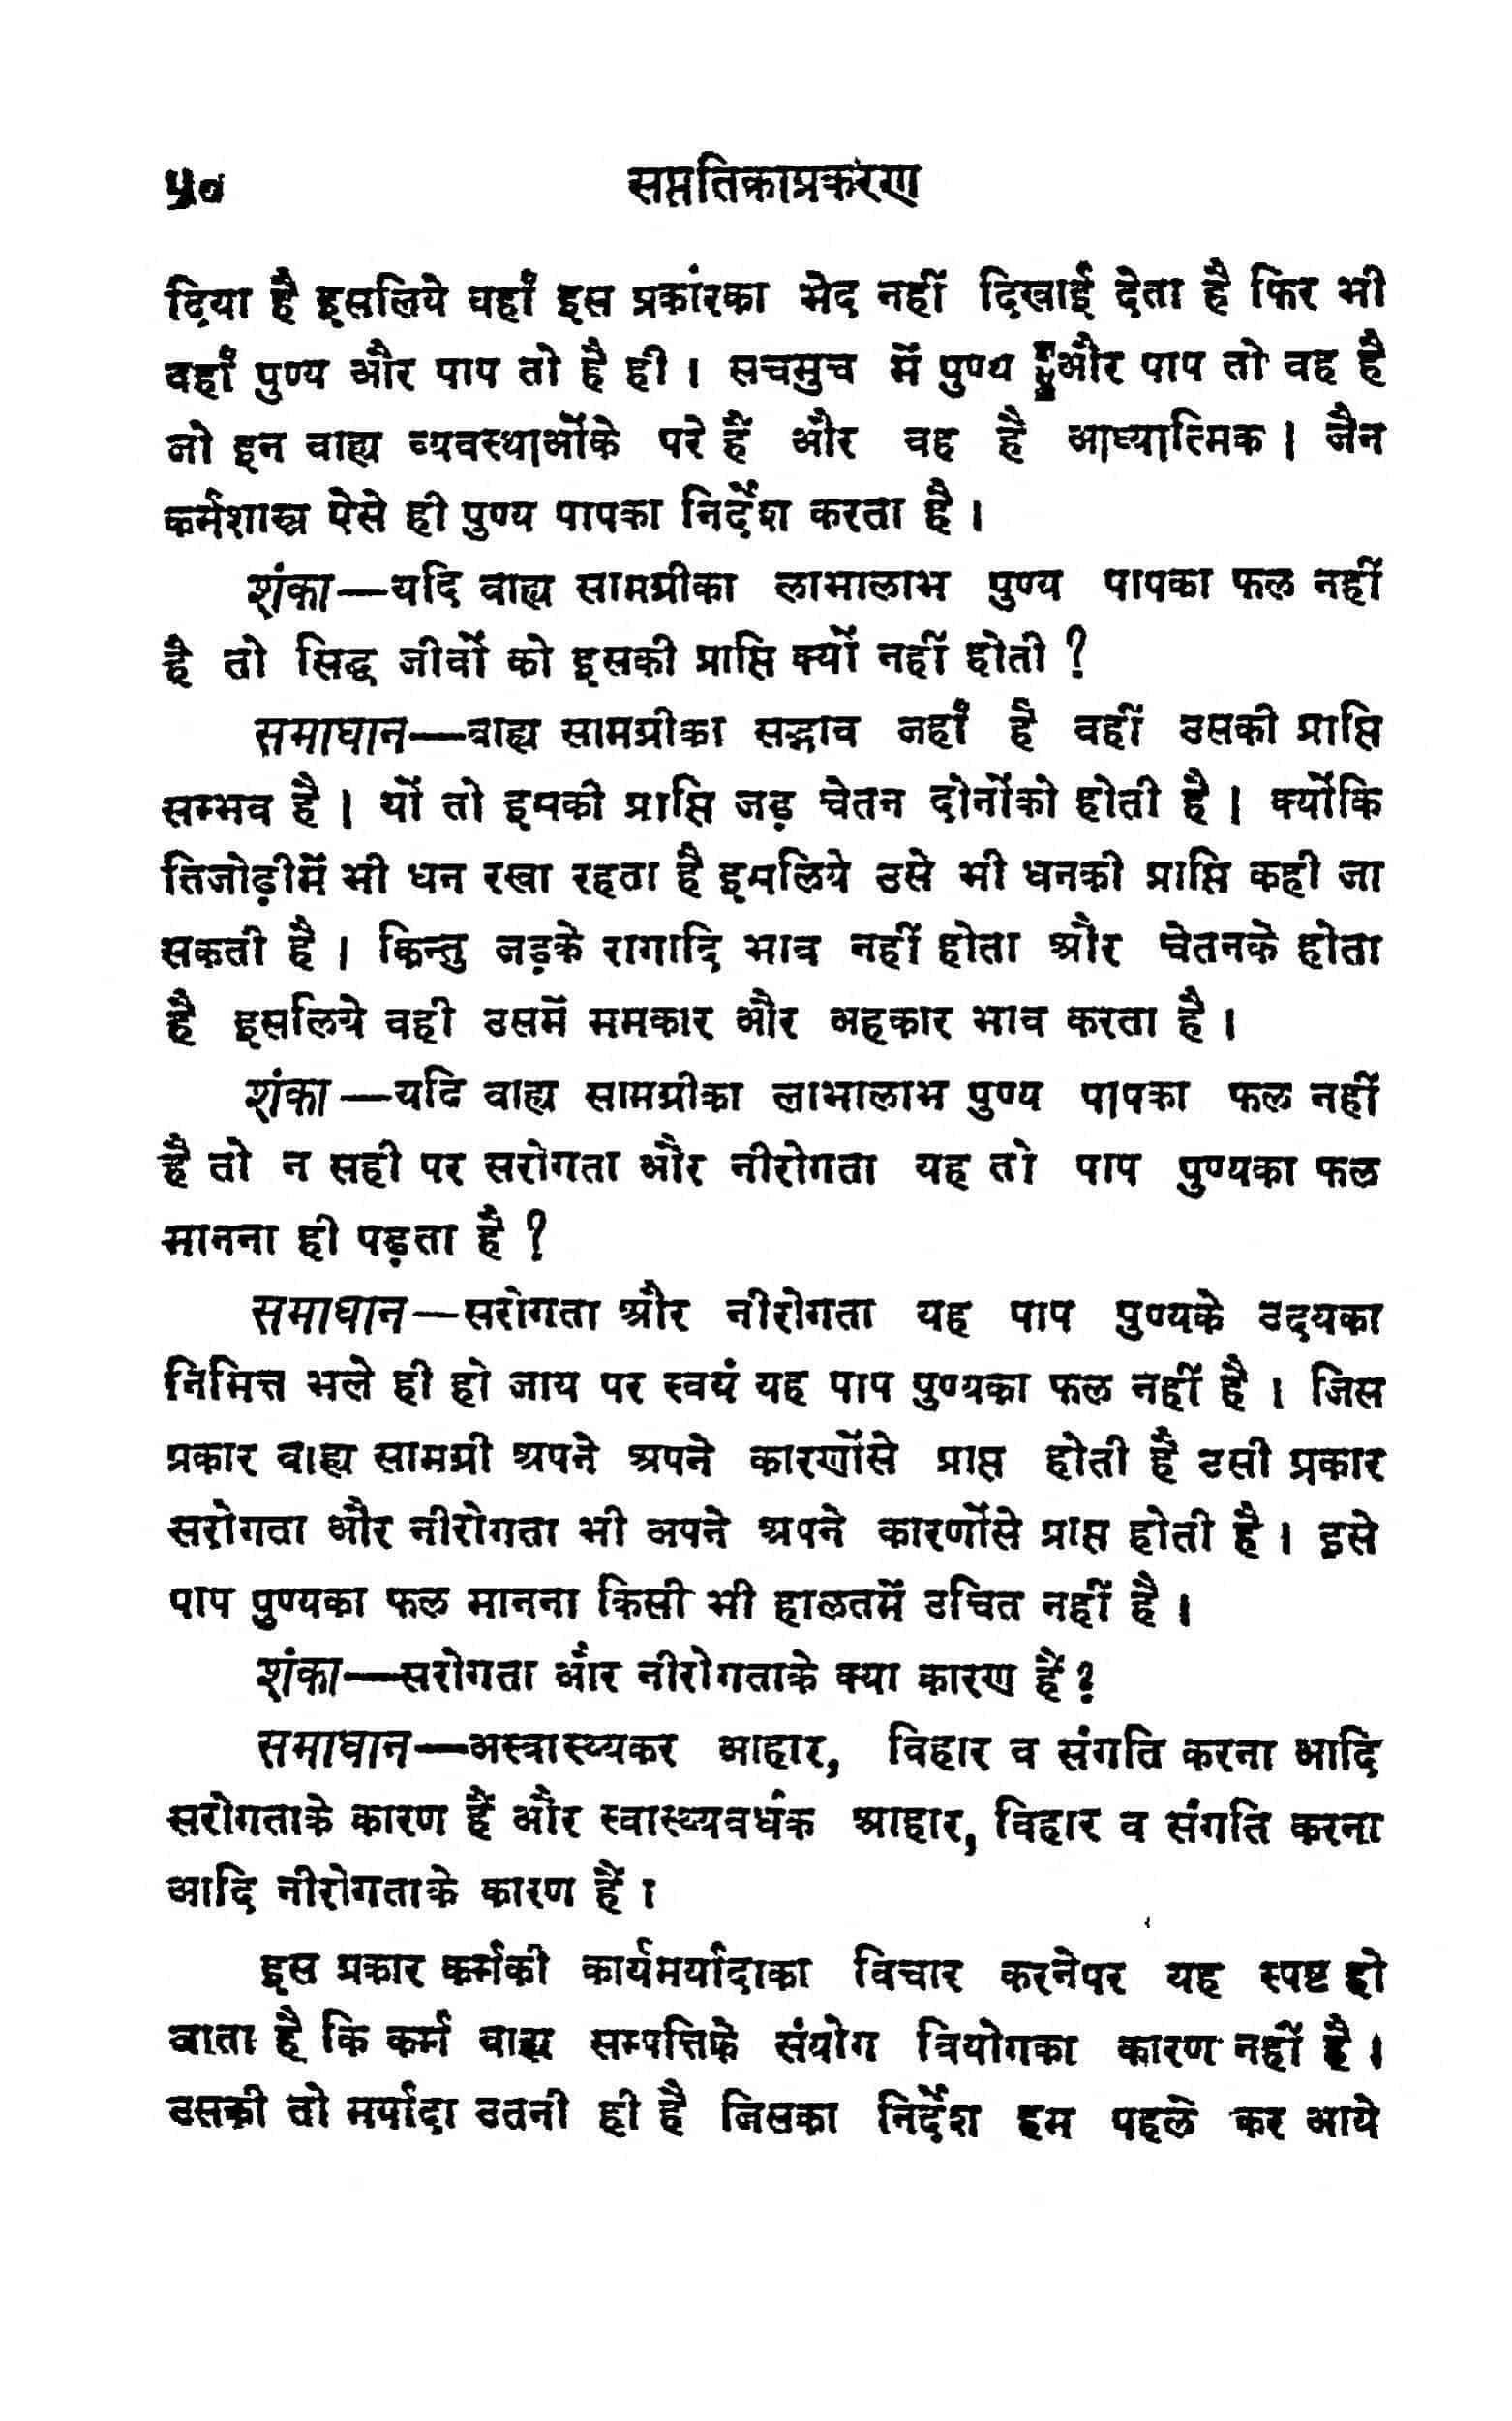 Book Image : सप्ततिकाप्रकरण - Saptatikaprakaran